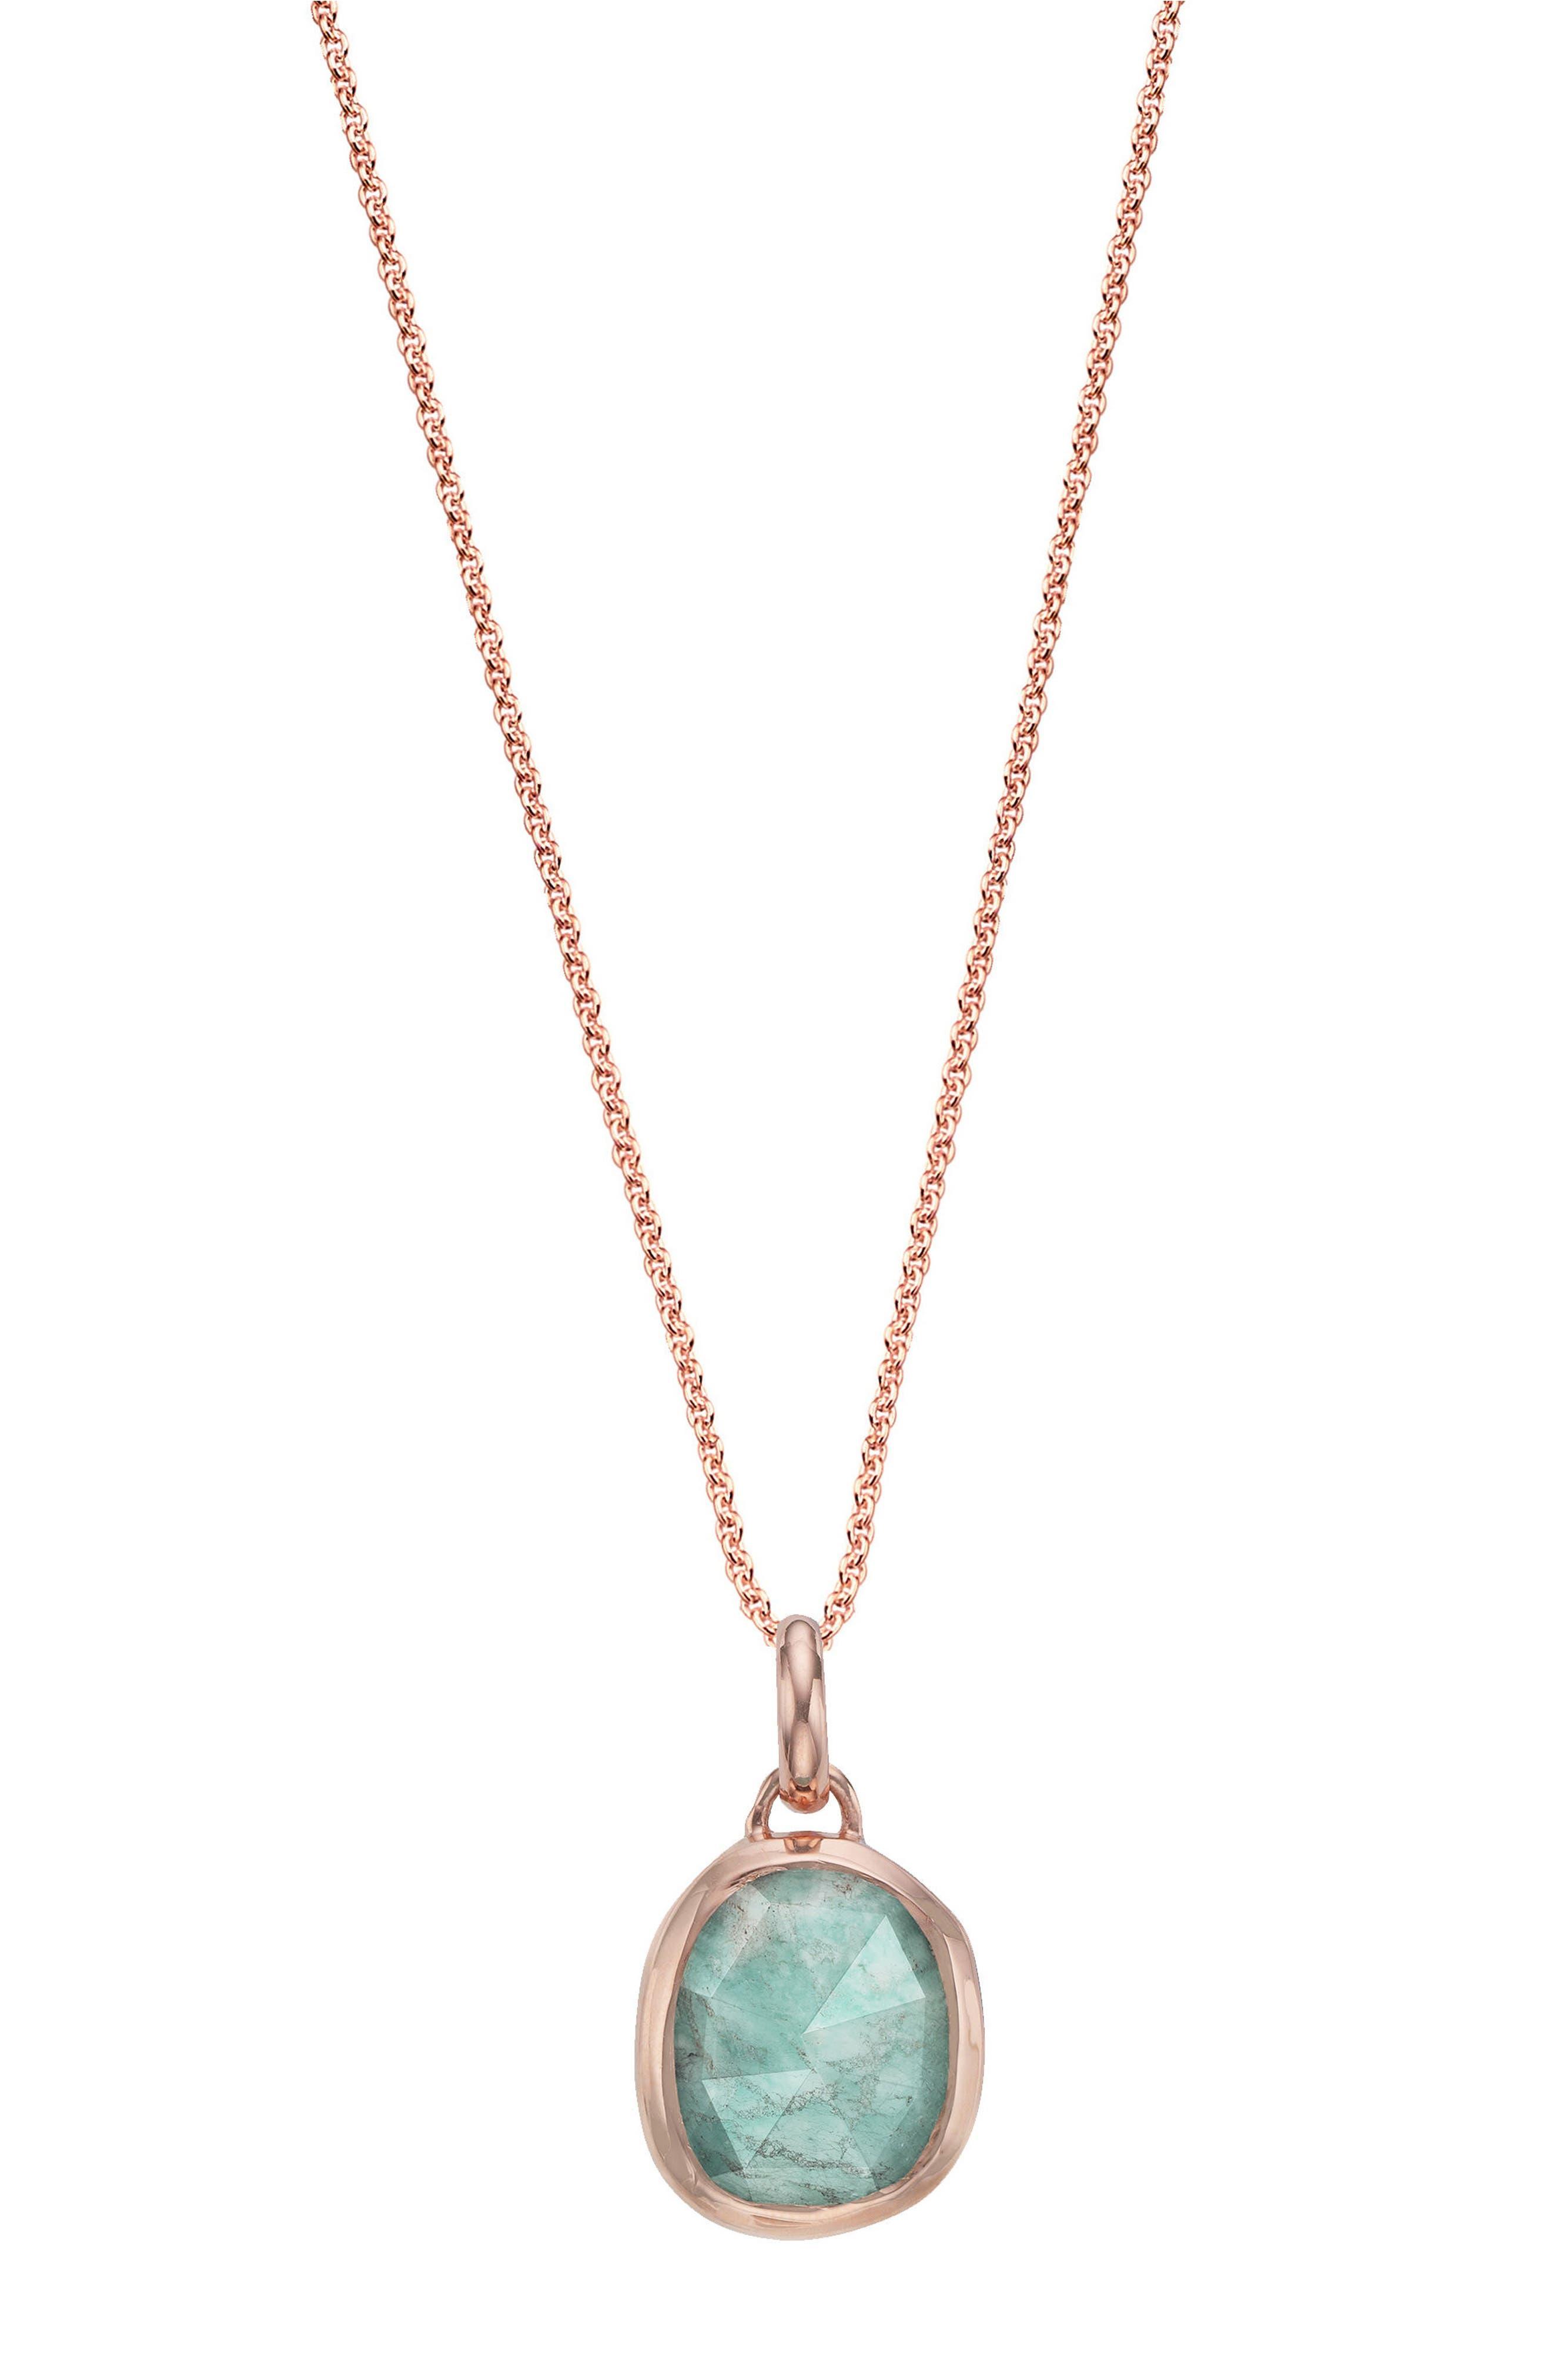 Monica Vinader Siren Semiprecious Stone Pendant Necklace (Nordstrom Exclusive)